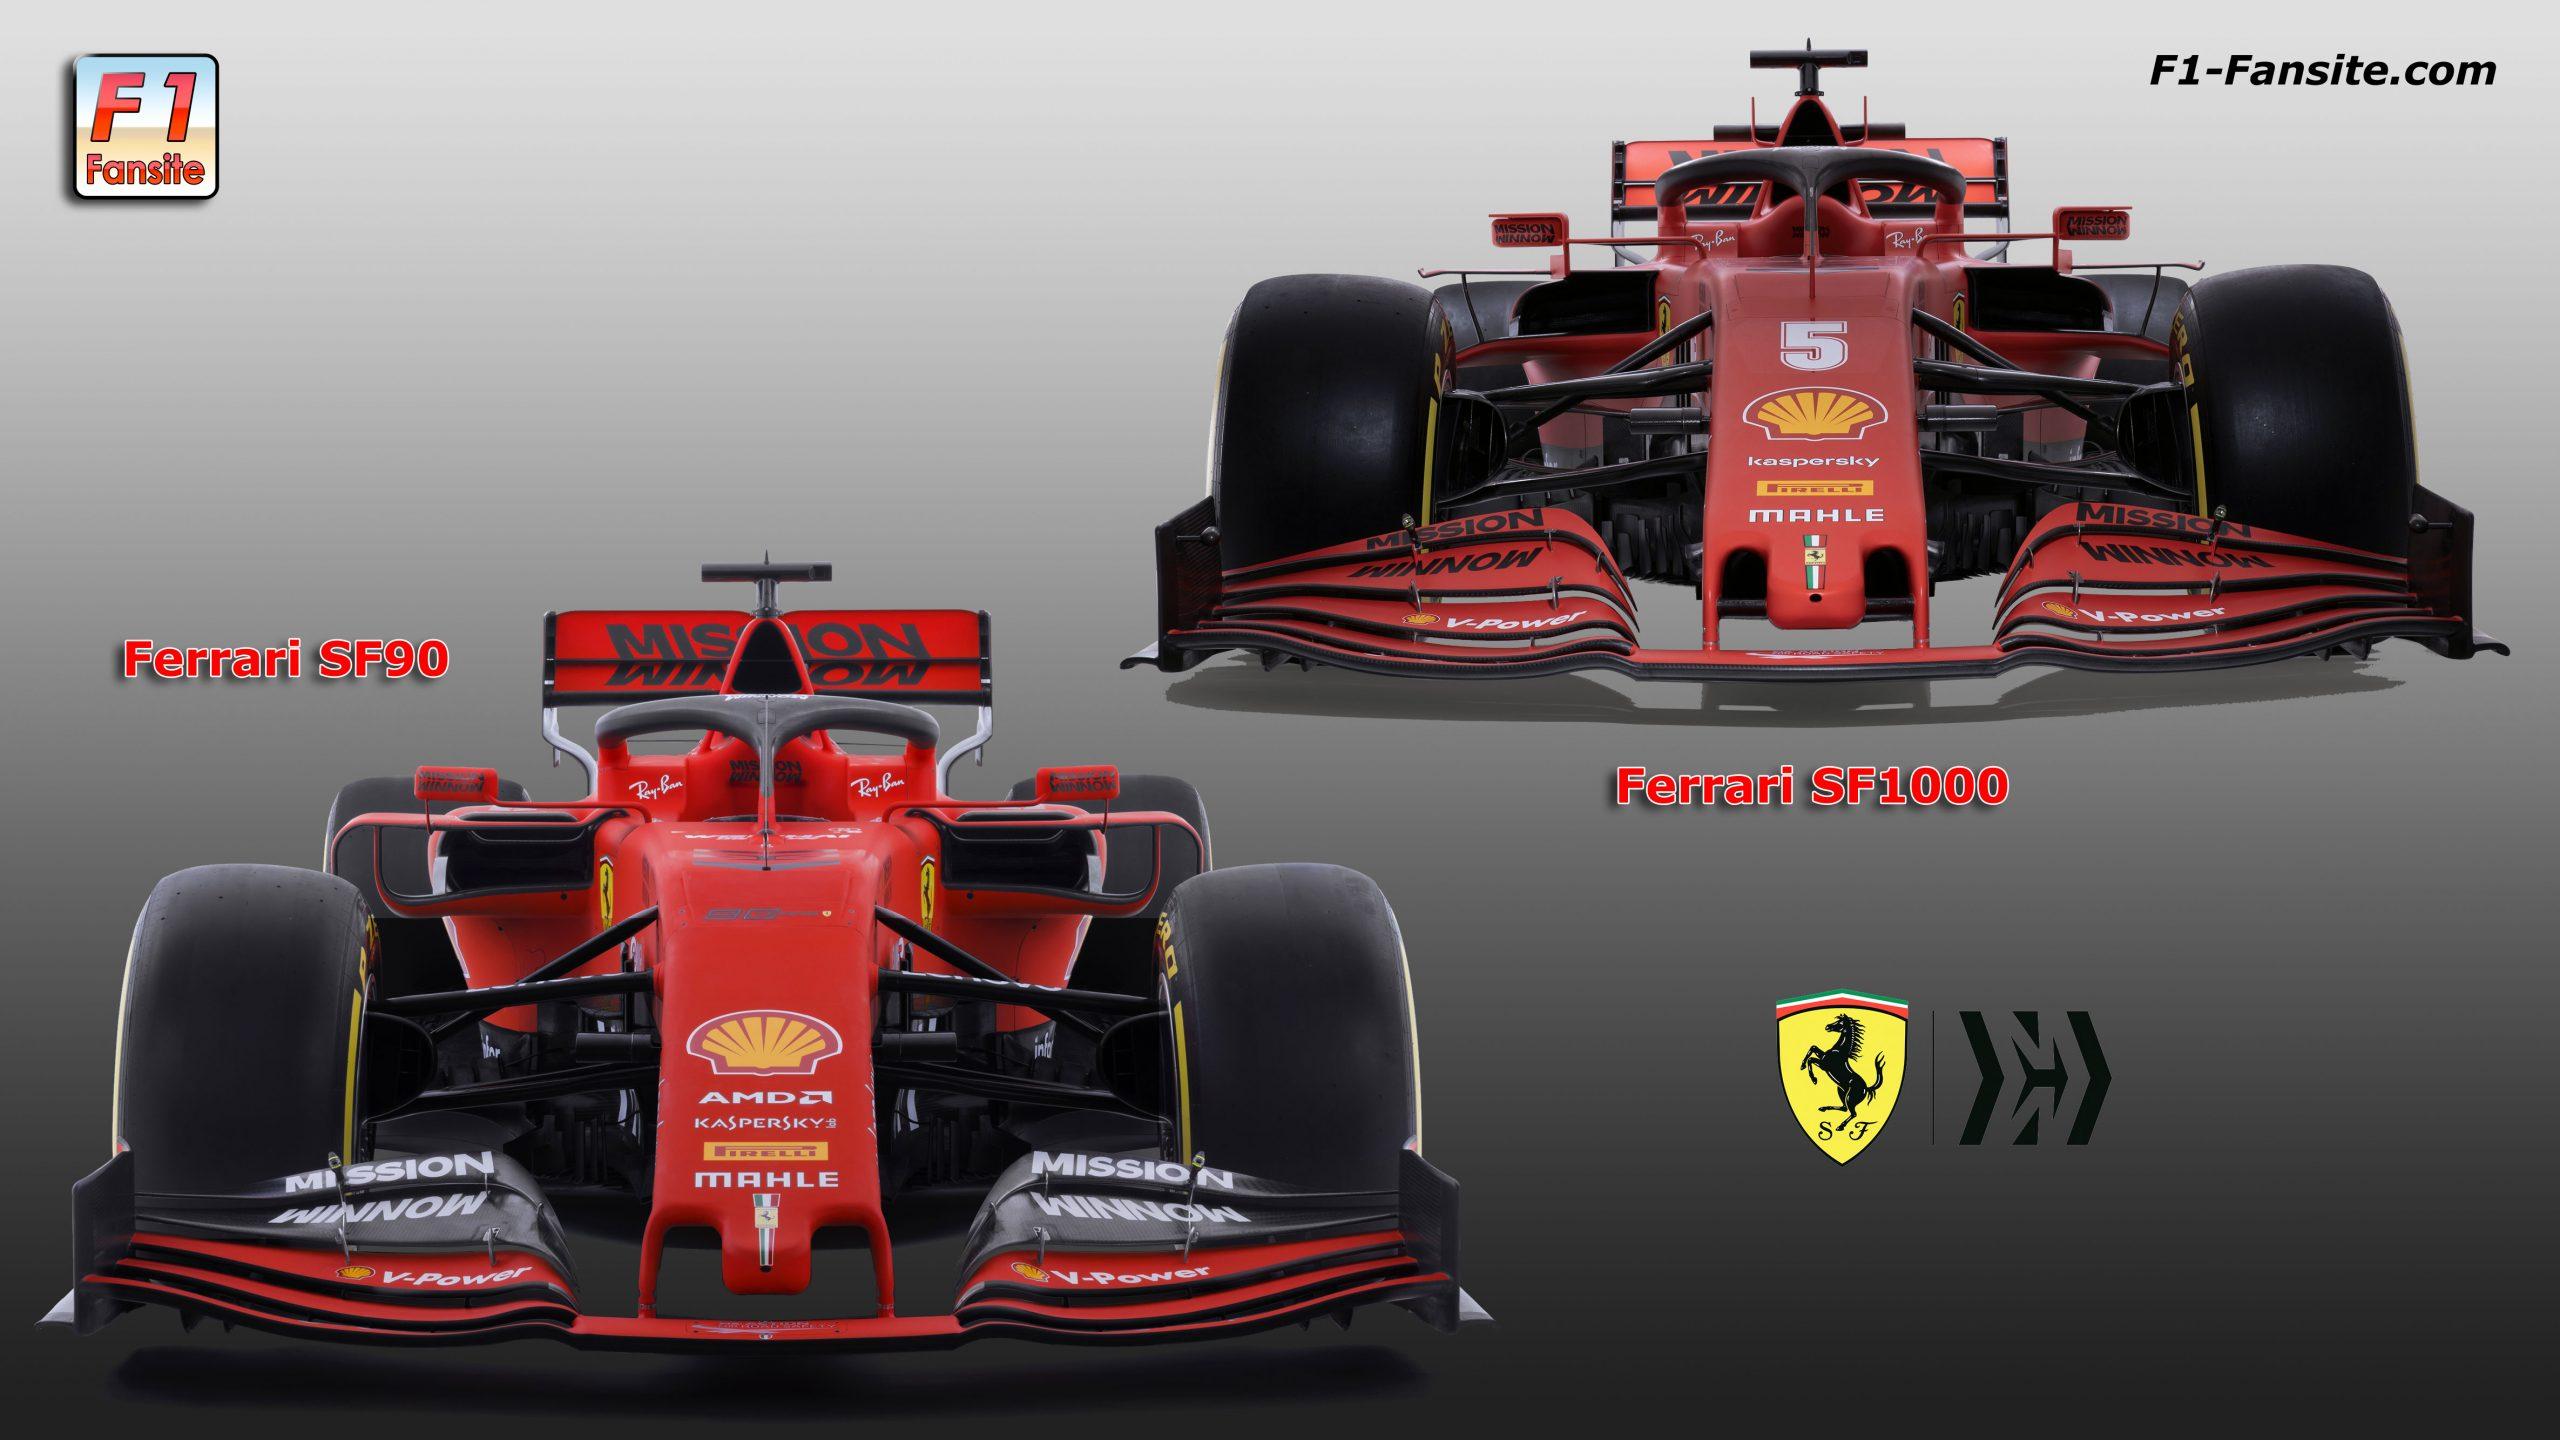 2020 Ferrari Sf1000 F1 Car Launch Pictures